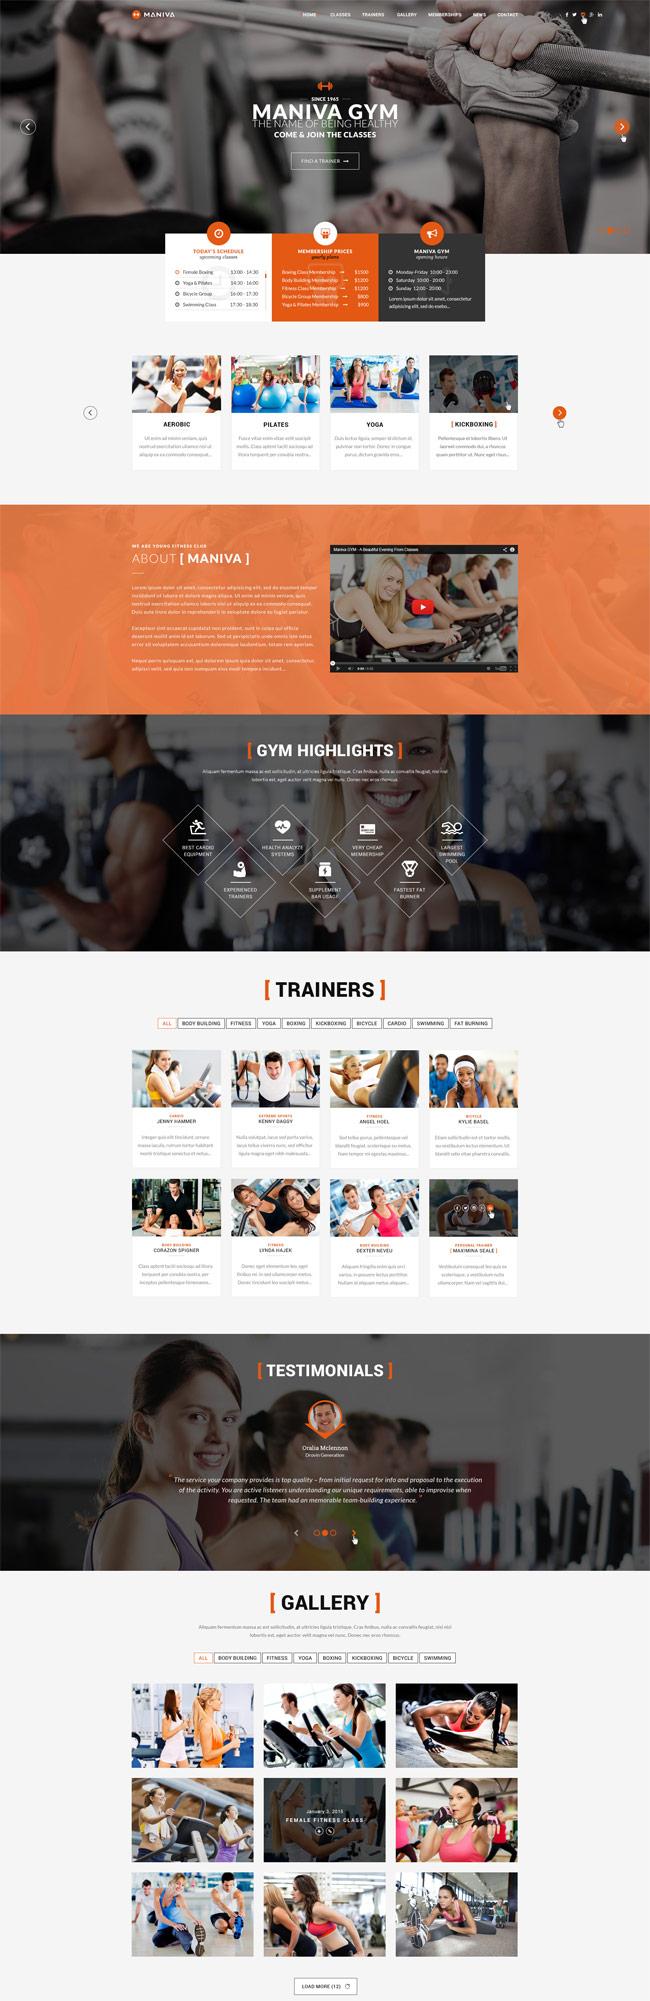 Gym-Fitness-Yoga-Maniva-WordPress-Theme